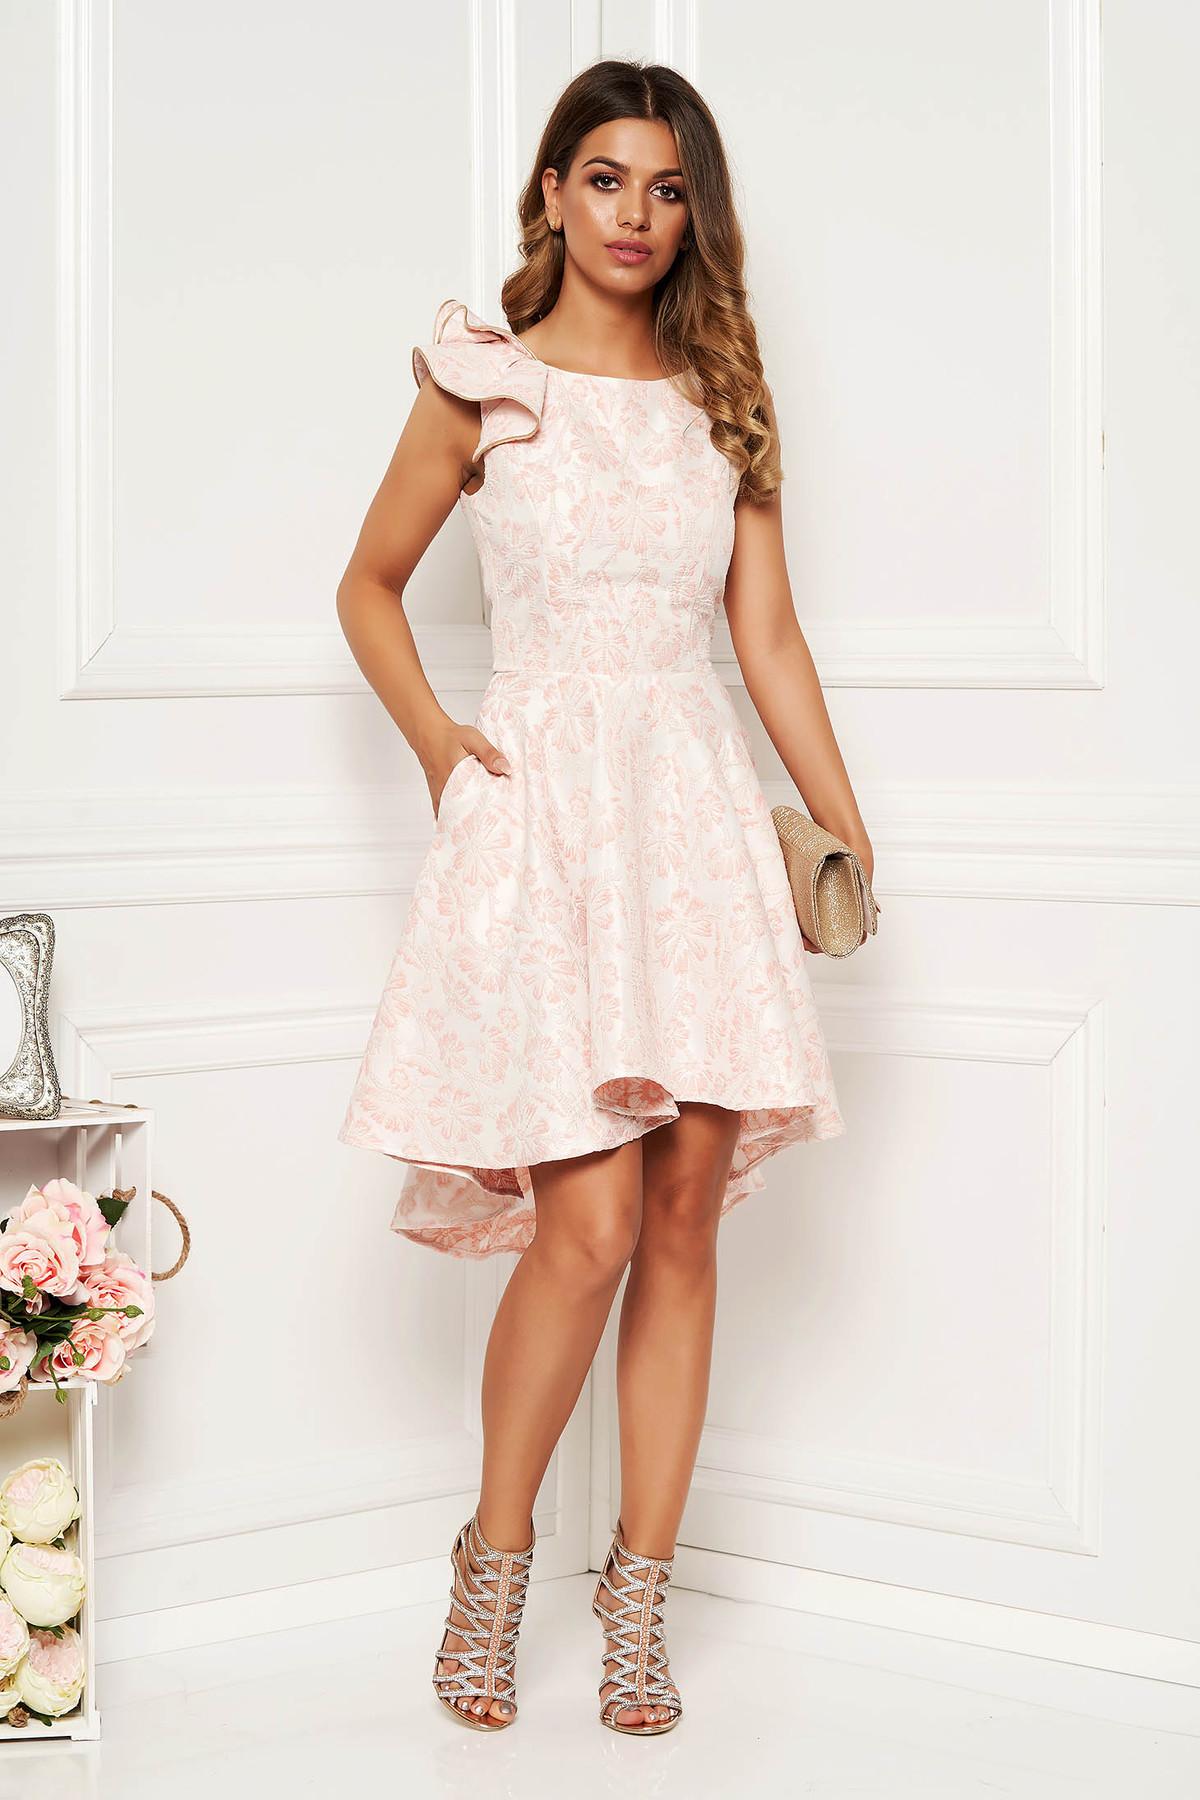 Rochie StarShinerS roz deschis eleganta de ocazie asimetrica in clos cu spatele decupat cu volanase la maneca